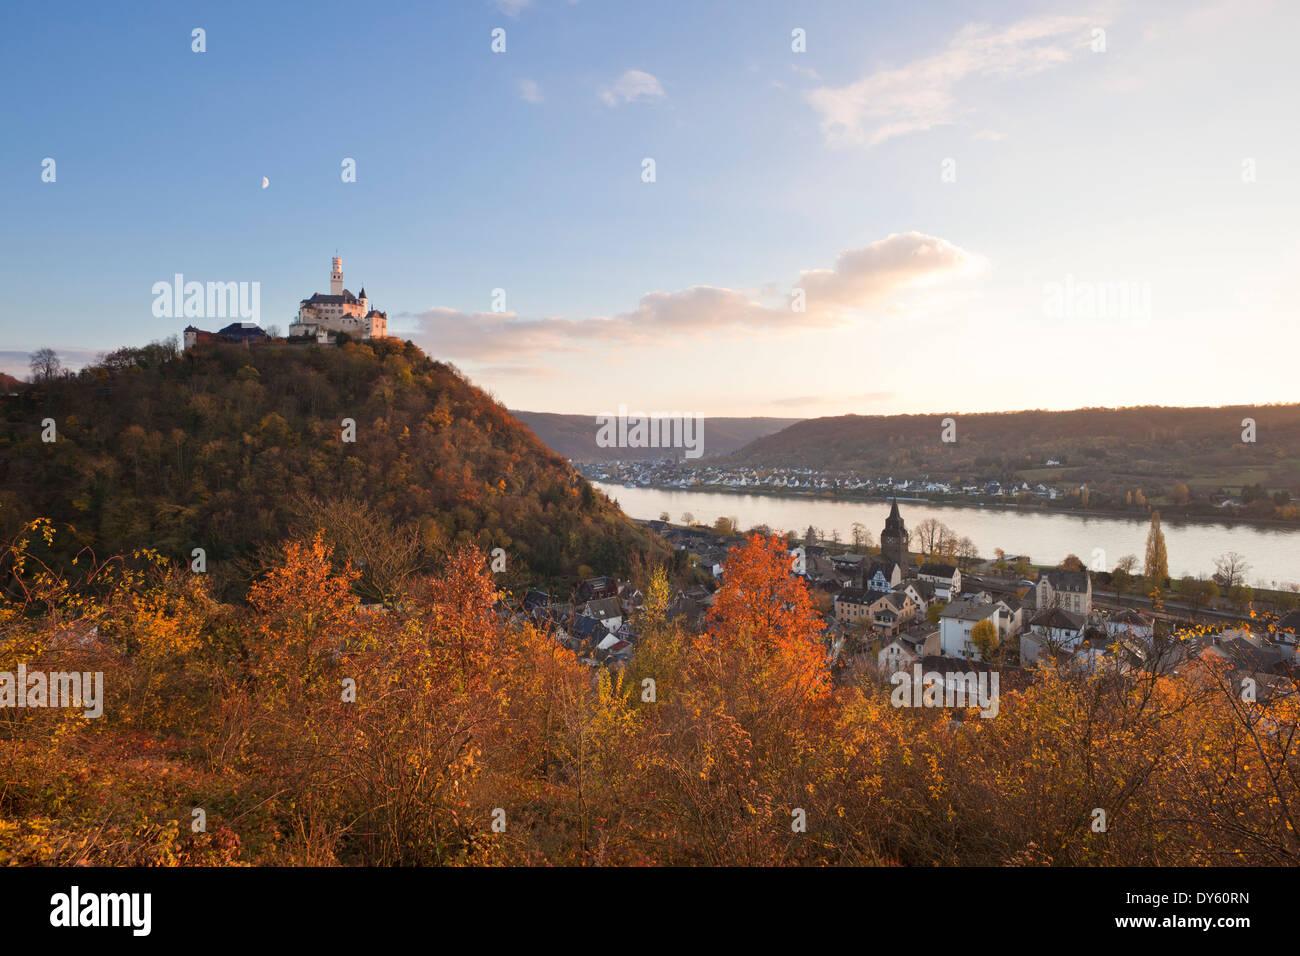 Marksburg castle, near Braubach, Rhine river, Rhineland-Palatinate, Germany Stock Photo